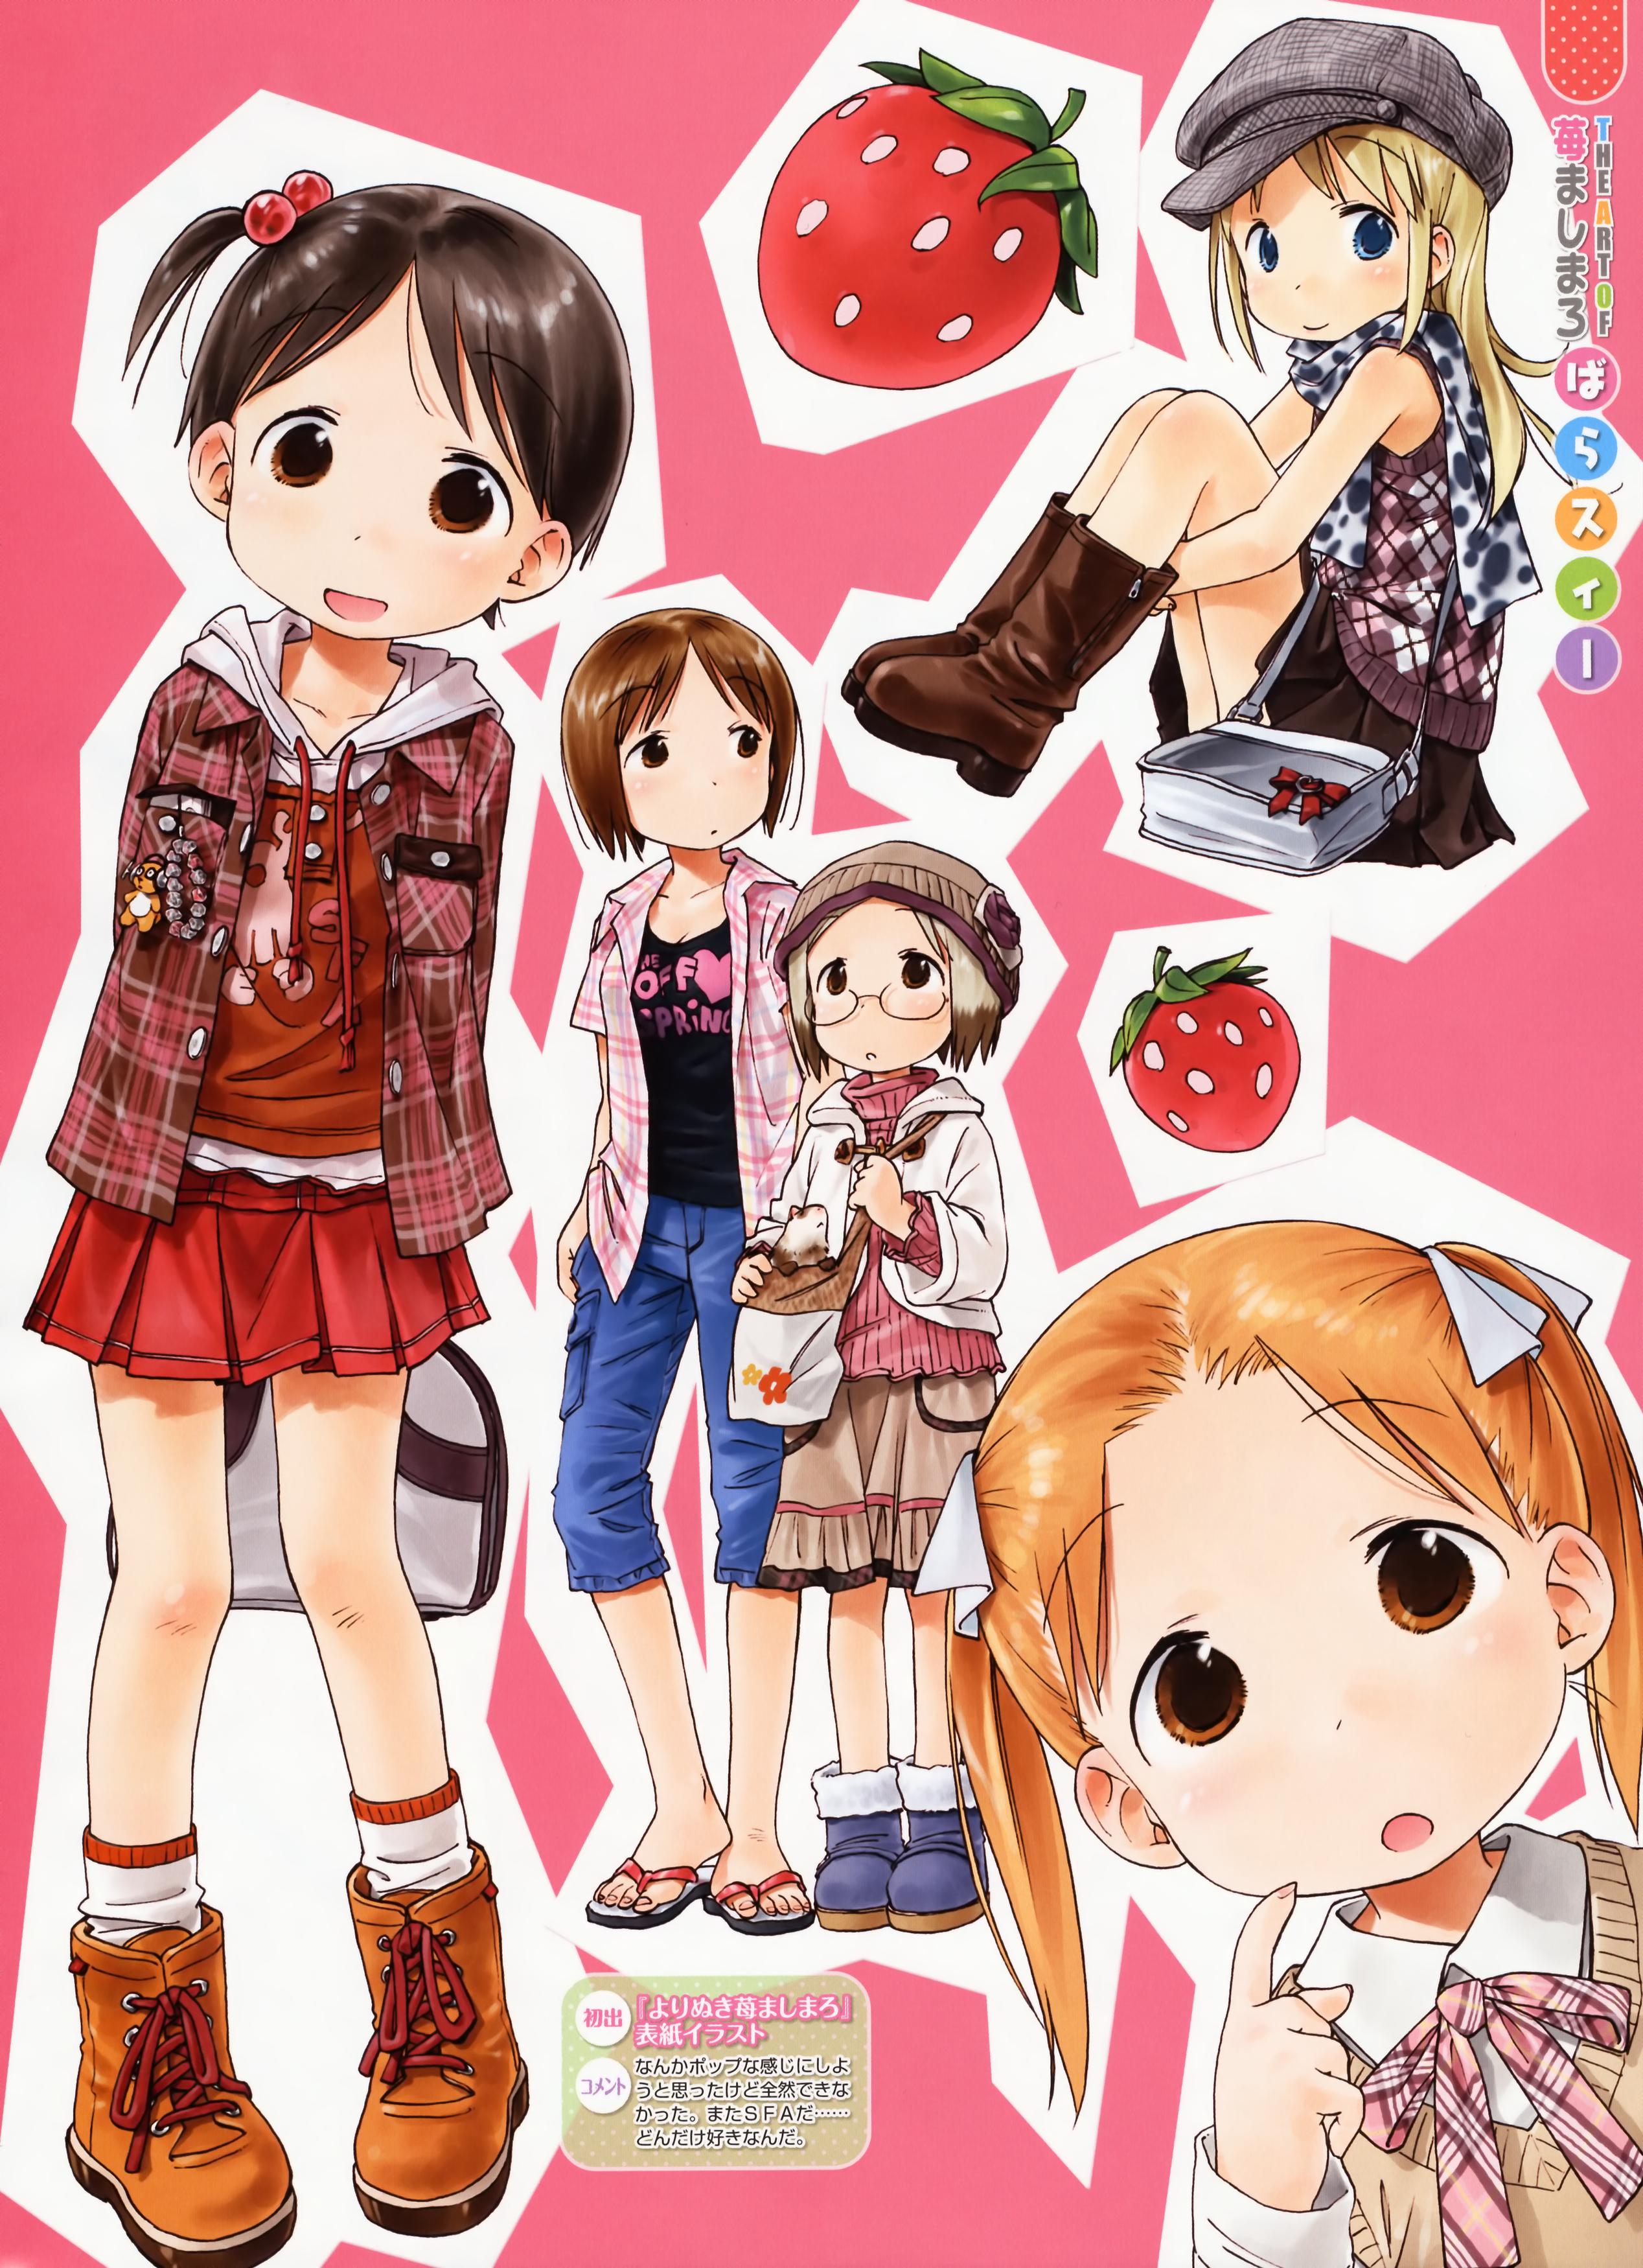 Ichigo Mashimaro Backgrounds, Compatible - PC, Mobile, Gadgets| 2536x3500 px